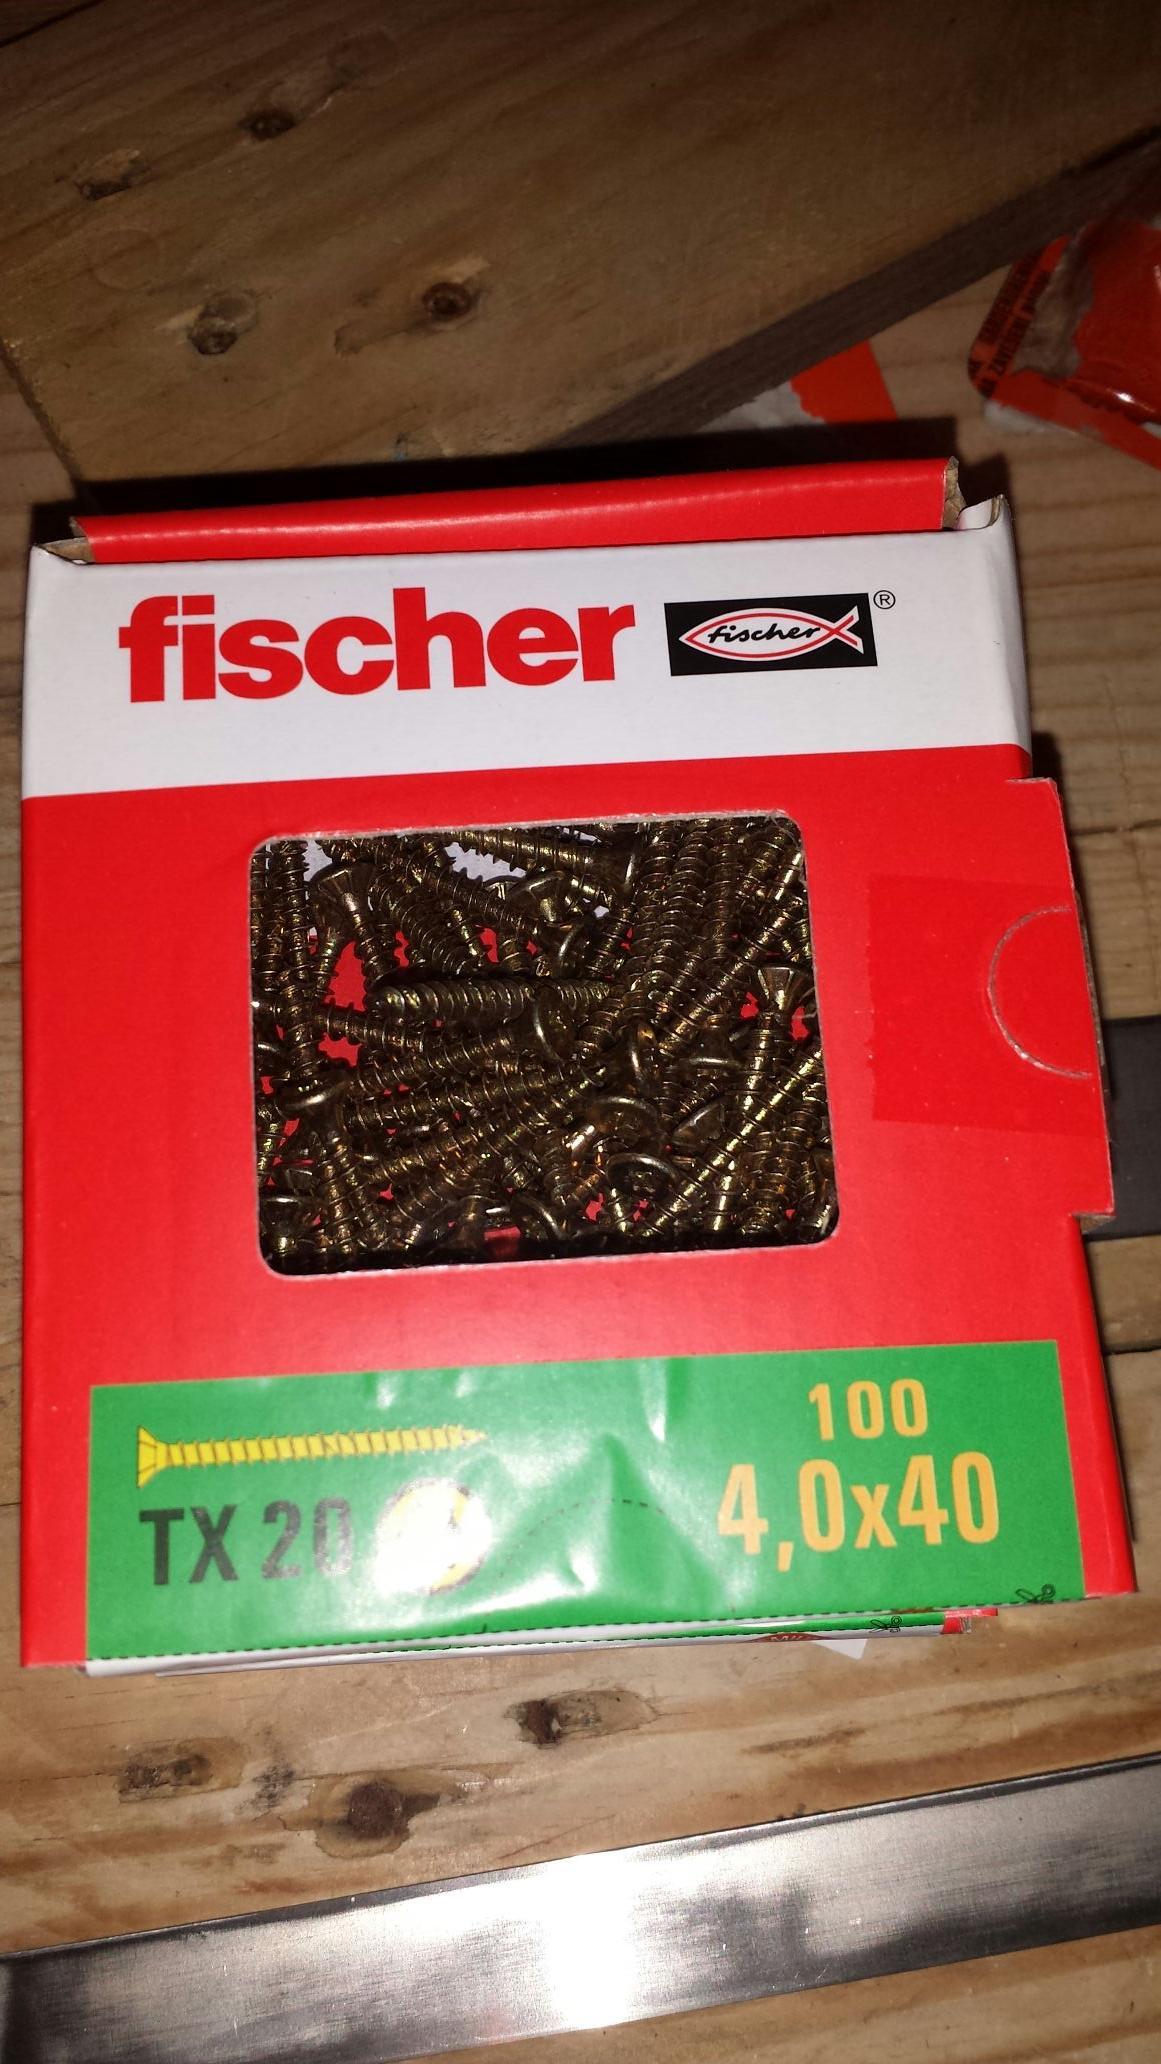 boîte de 100 Vis fischer TX20 4,0 x 40